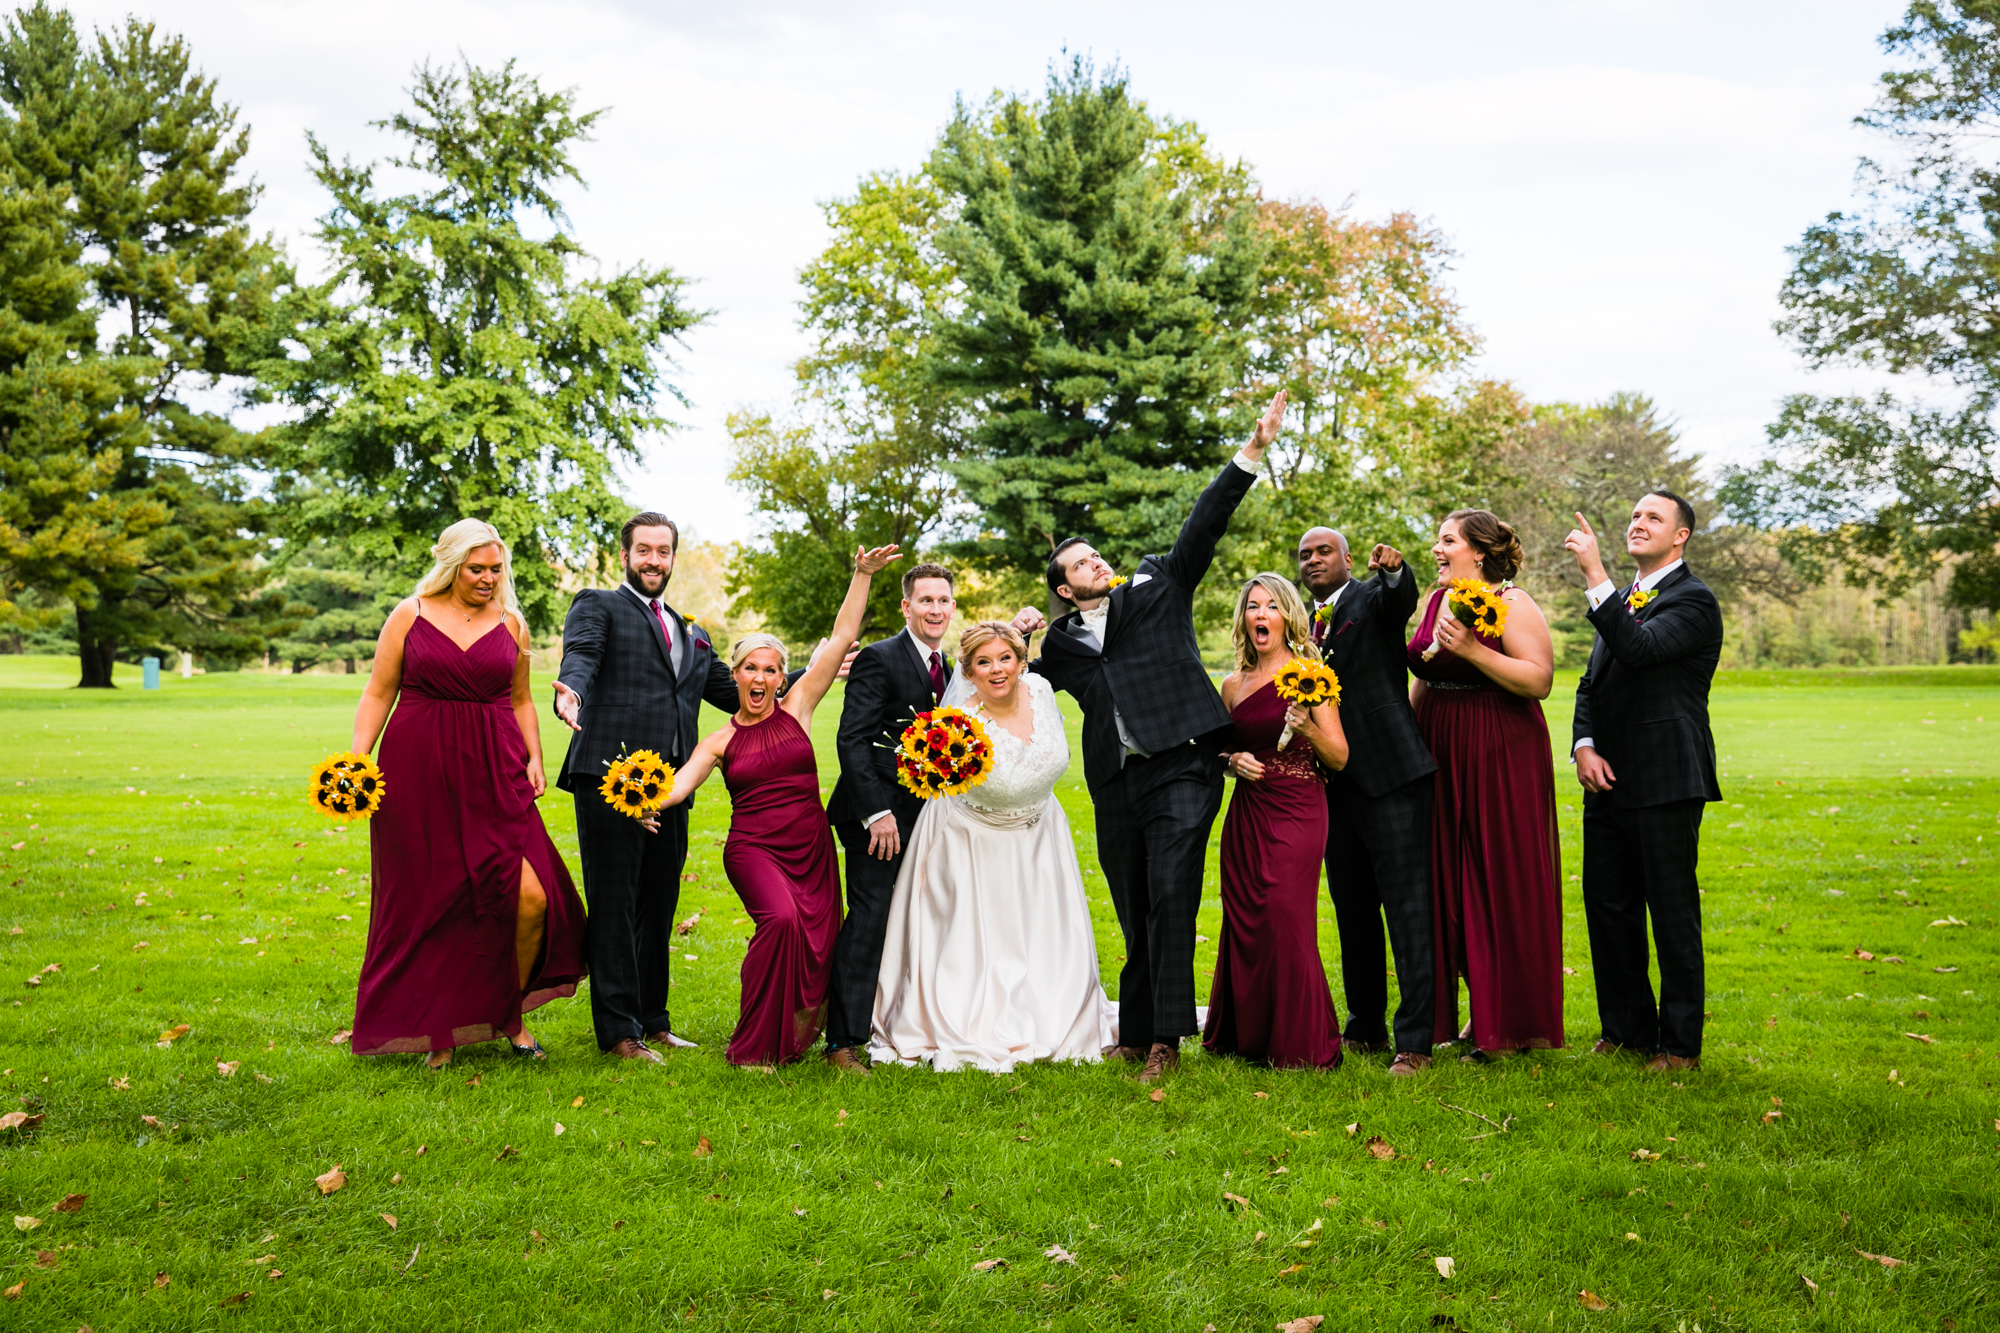 Cedar Brook Country Club Wedding Photography - Lovestruck Pictures-044.jpg